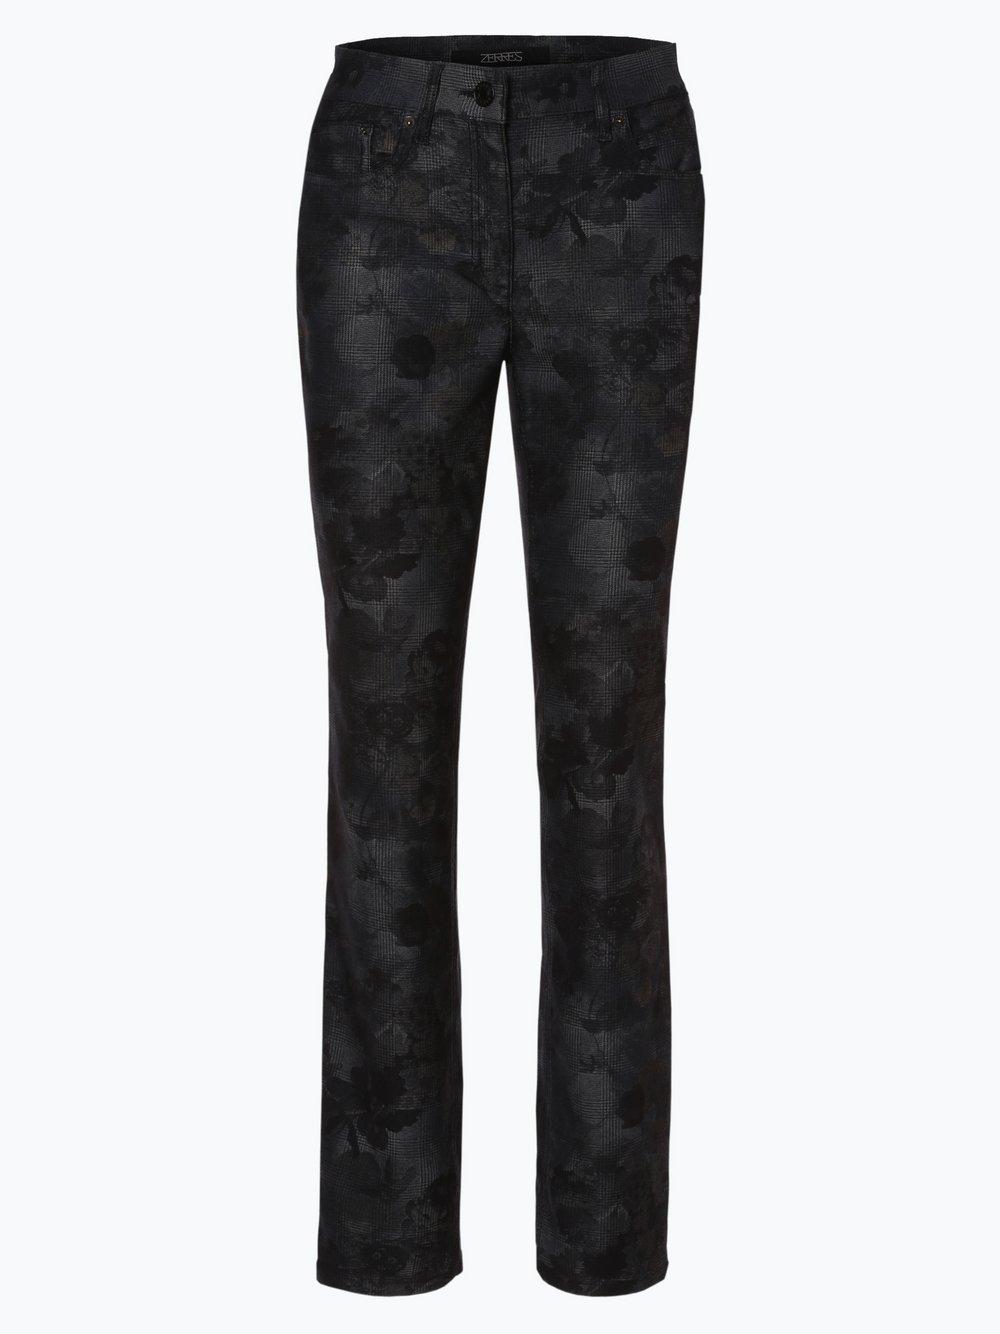 Zerres – Spodnie damskie – Comfort S, szary Van Graaf 418765-0002-00400